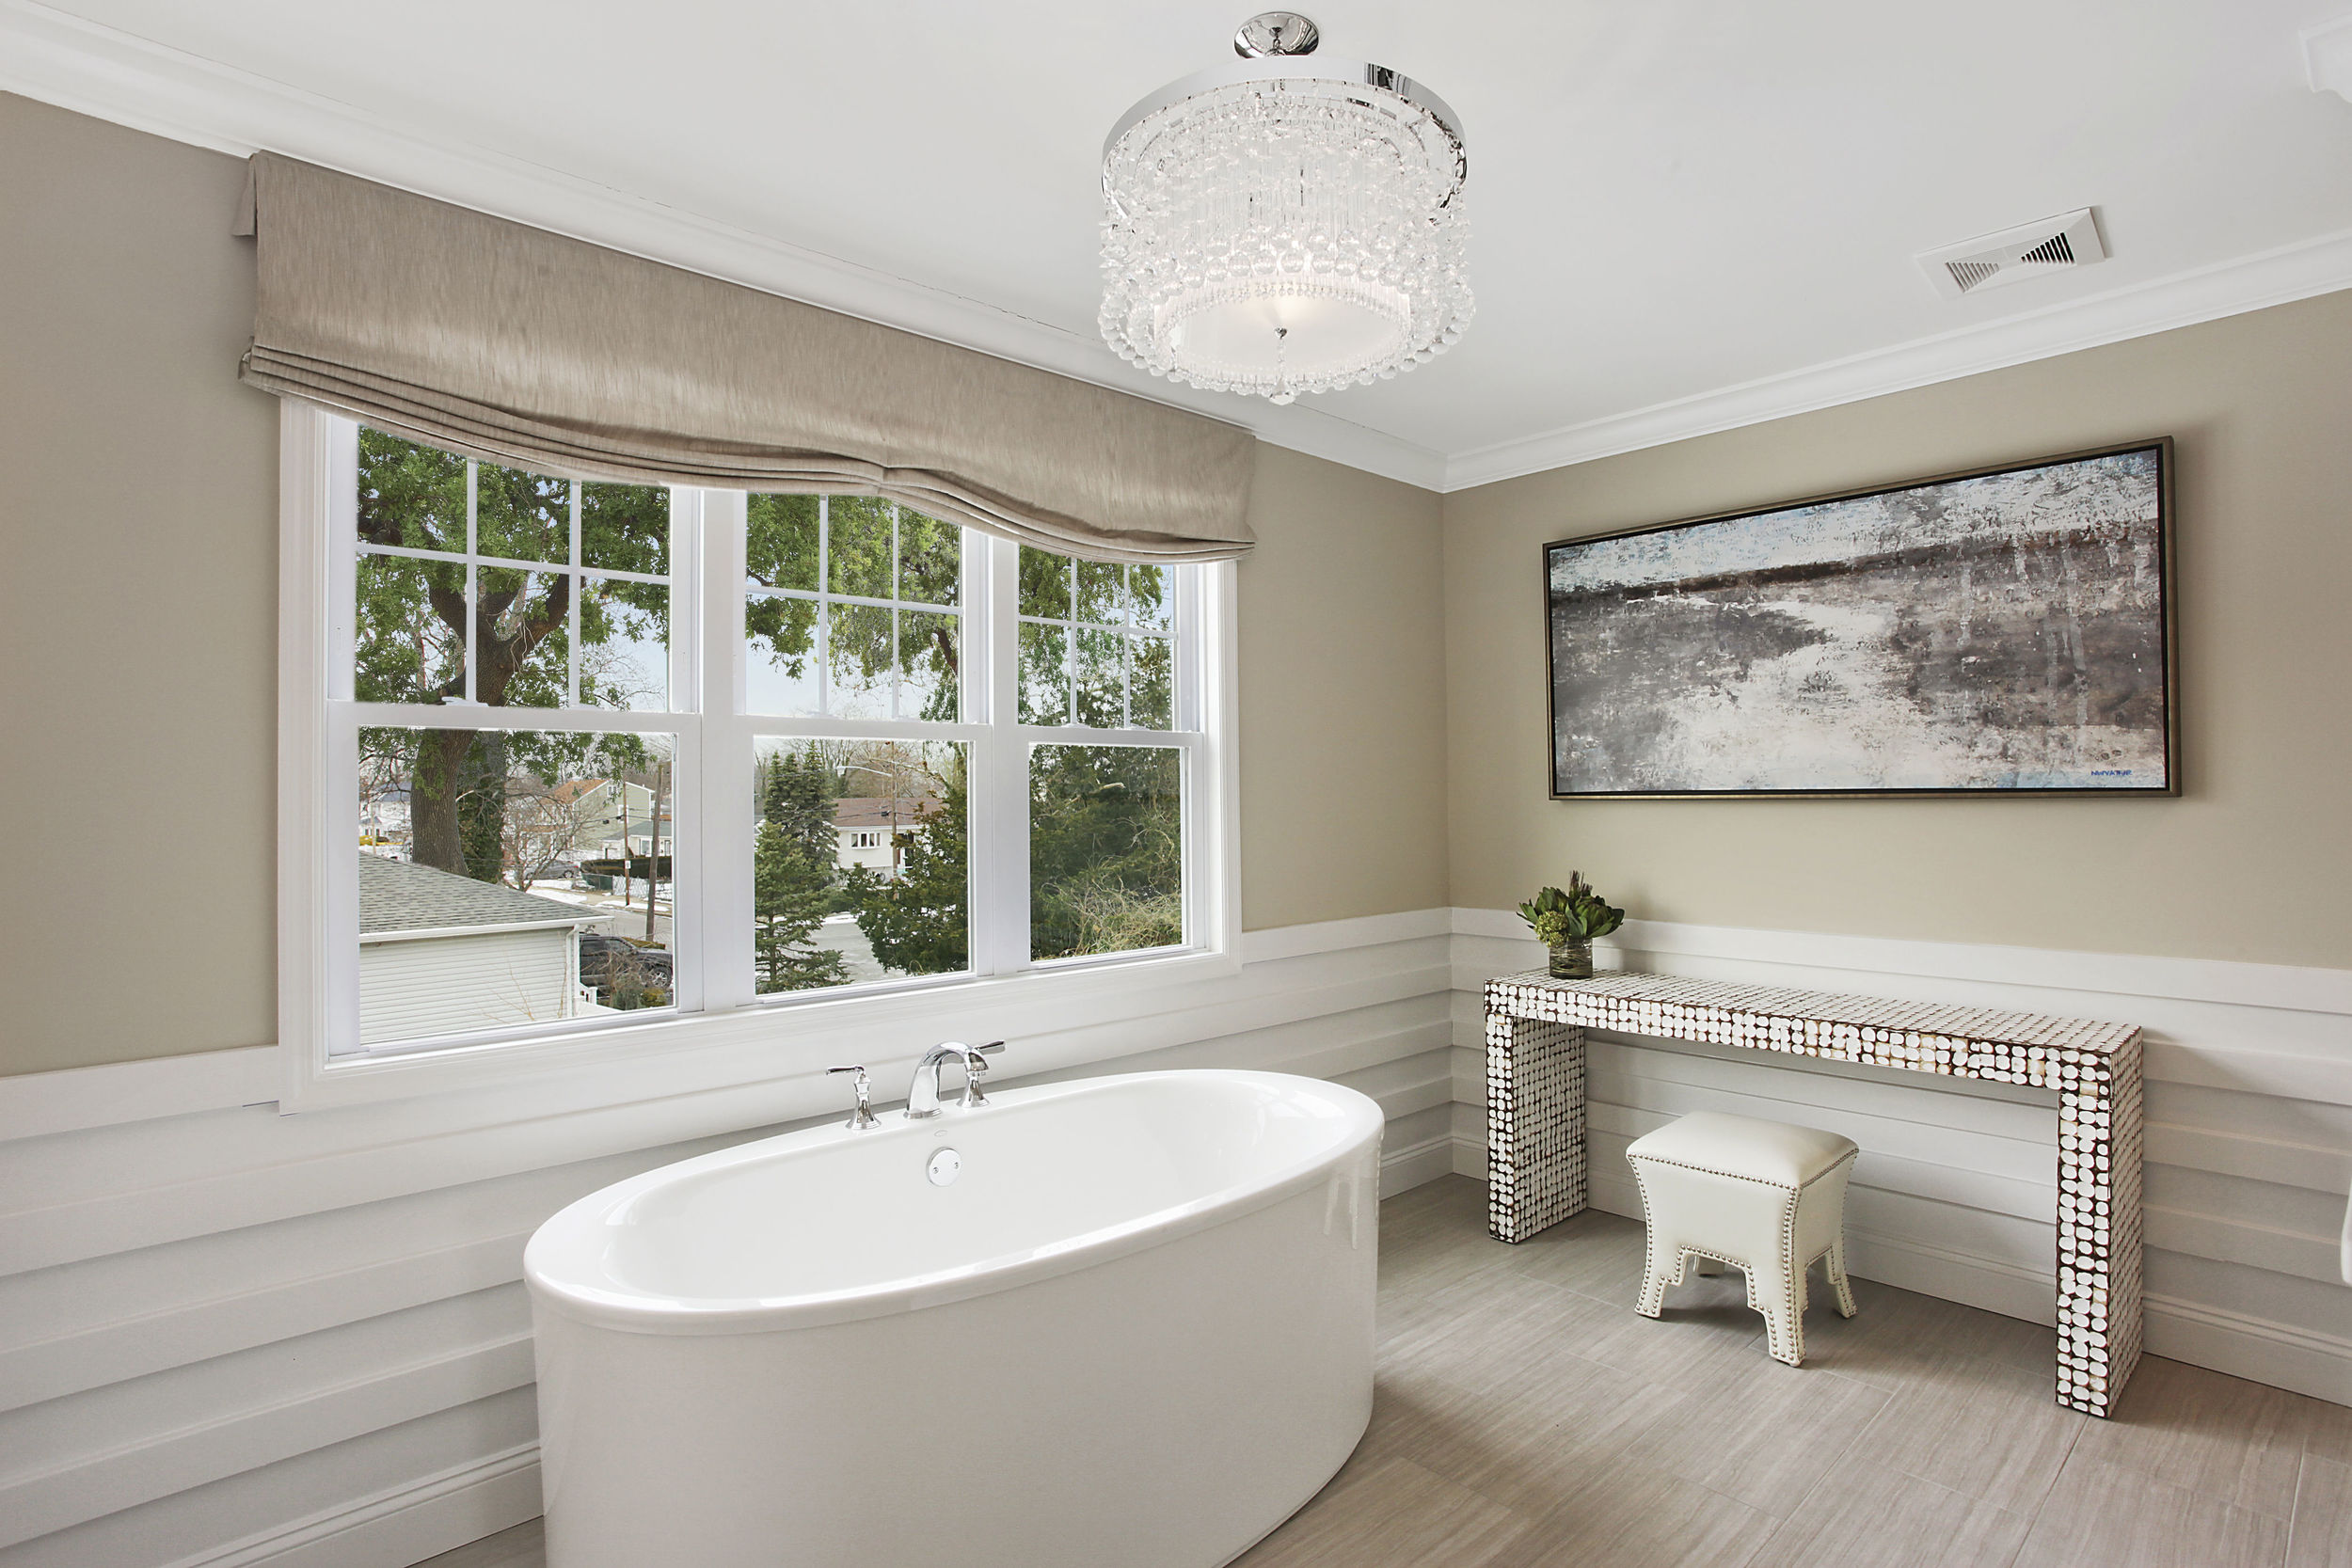 Six Simple Design Ideas to Create a Spa-Like Bathroom ... on Bathroom Model  id=24722